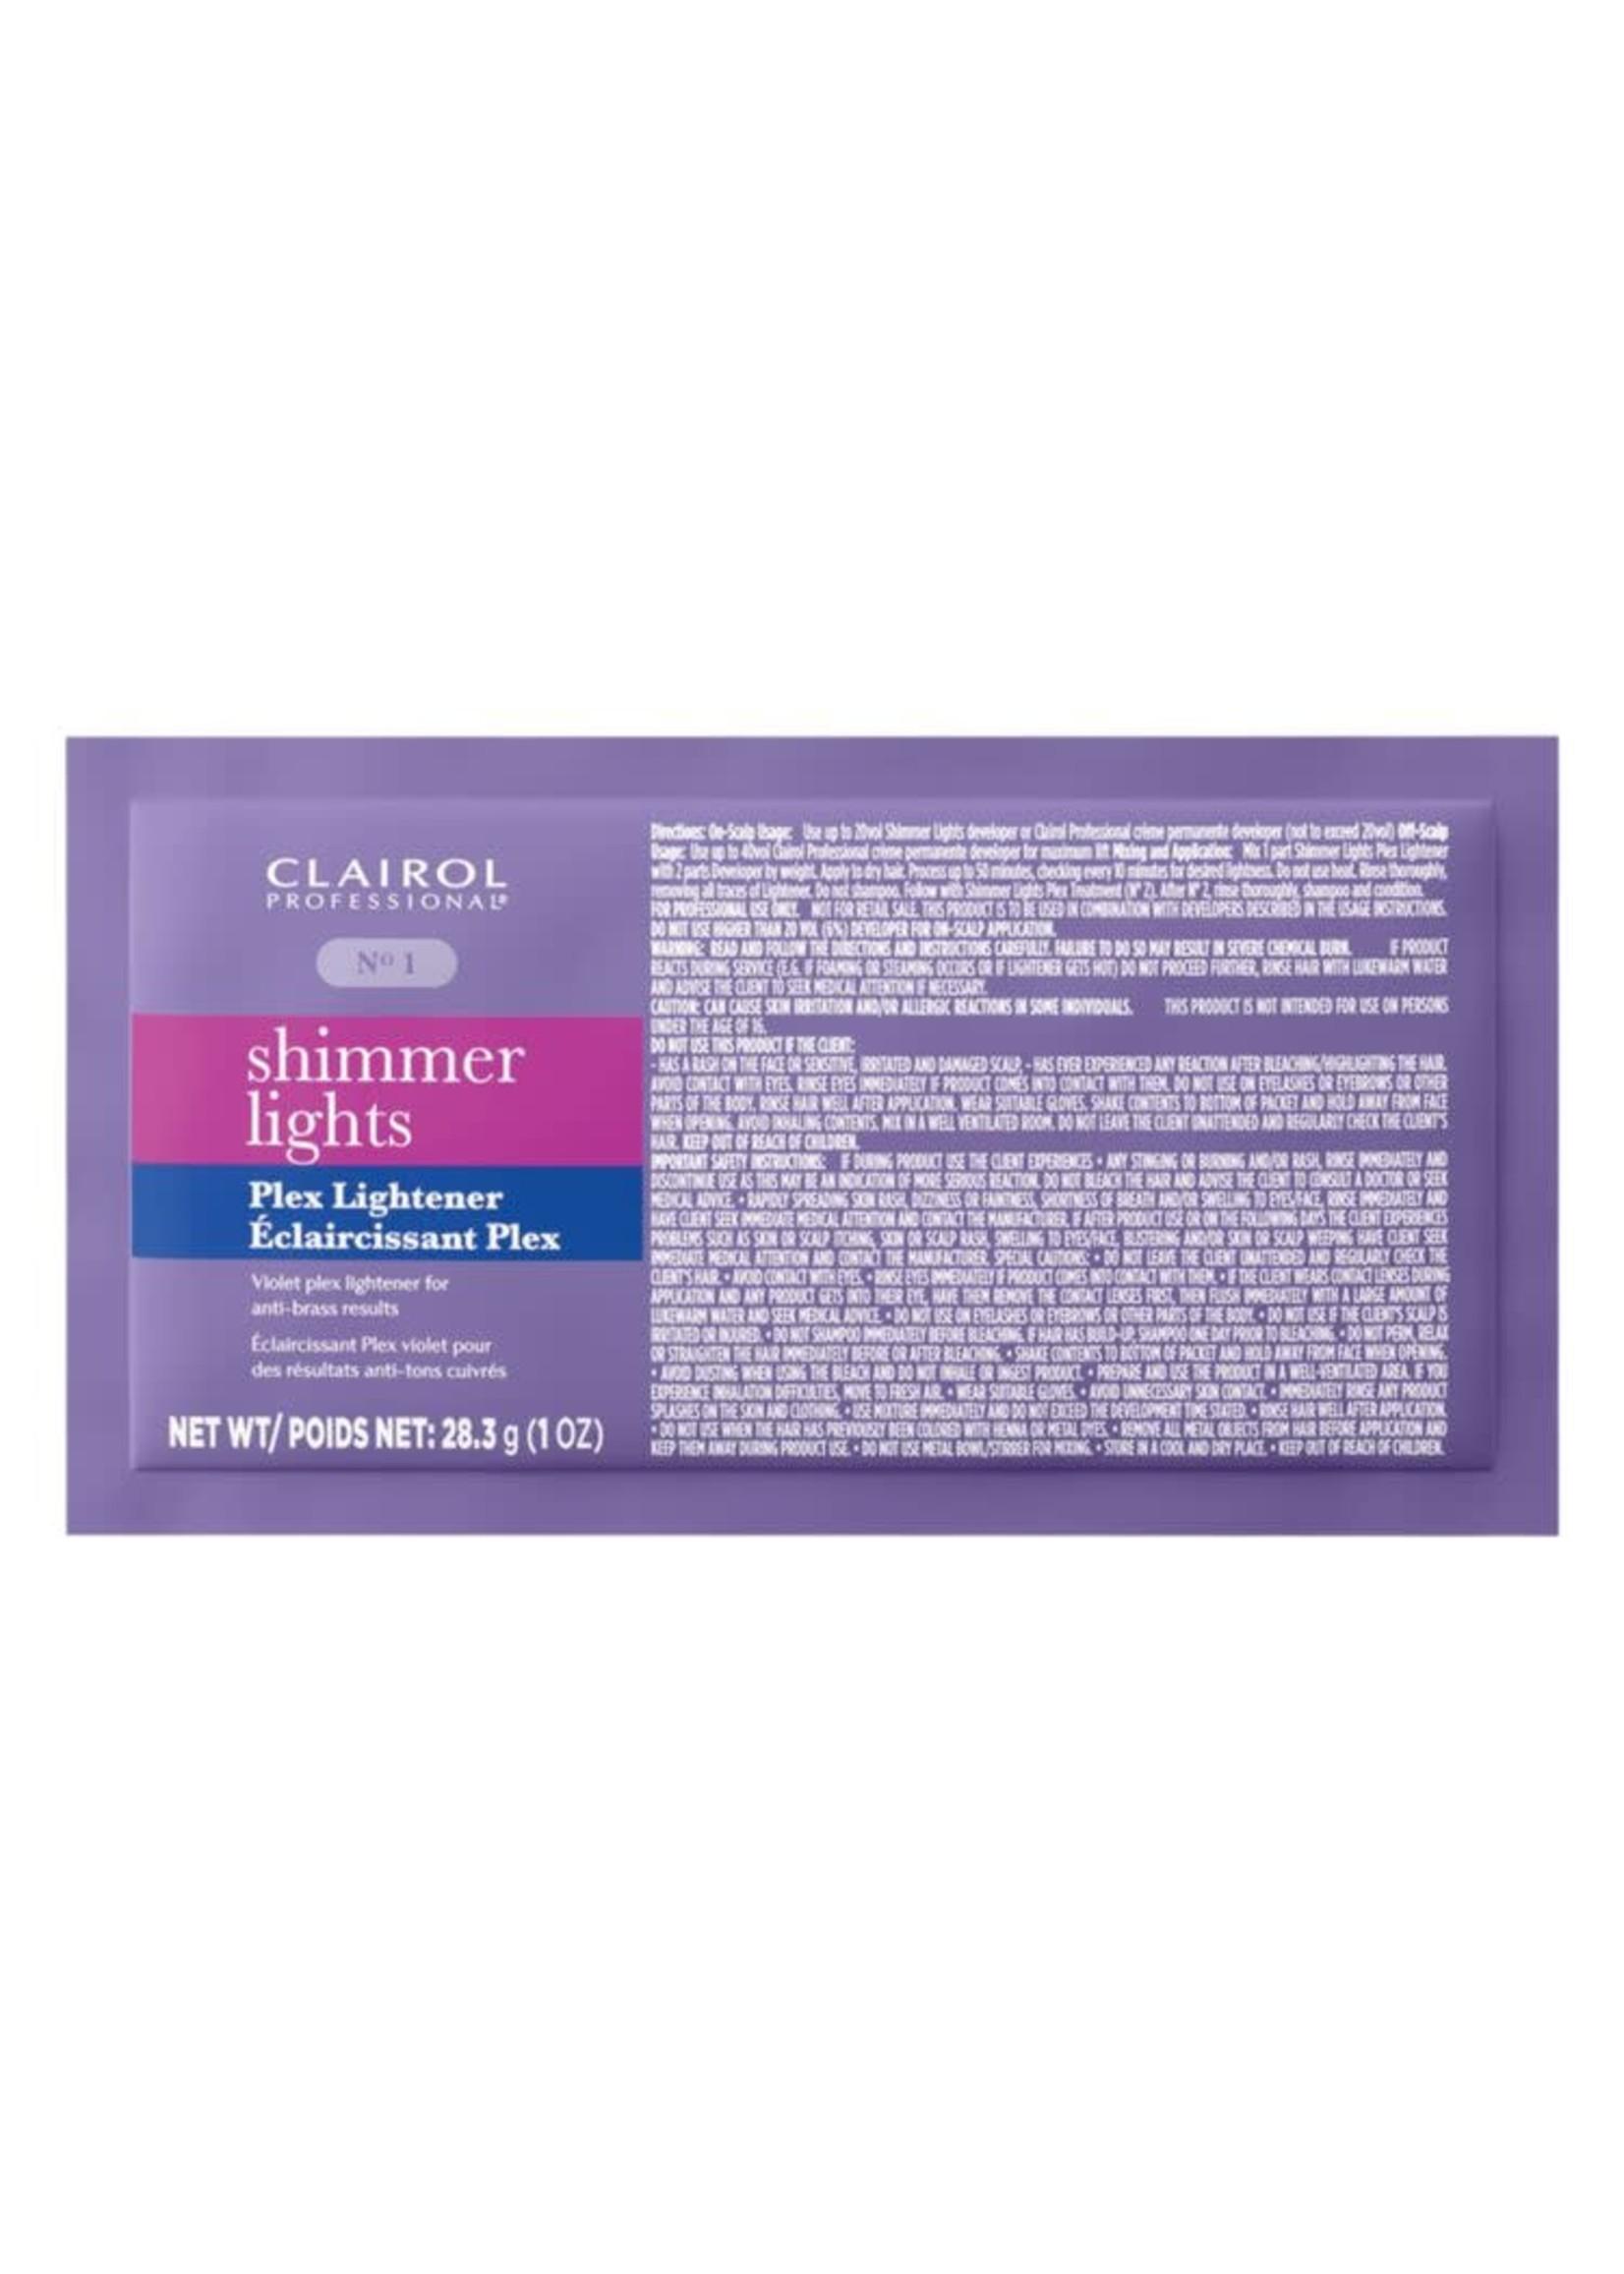 Clairol Professional Shimmer Lights Plex Lightener